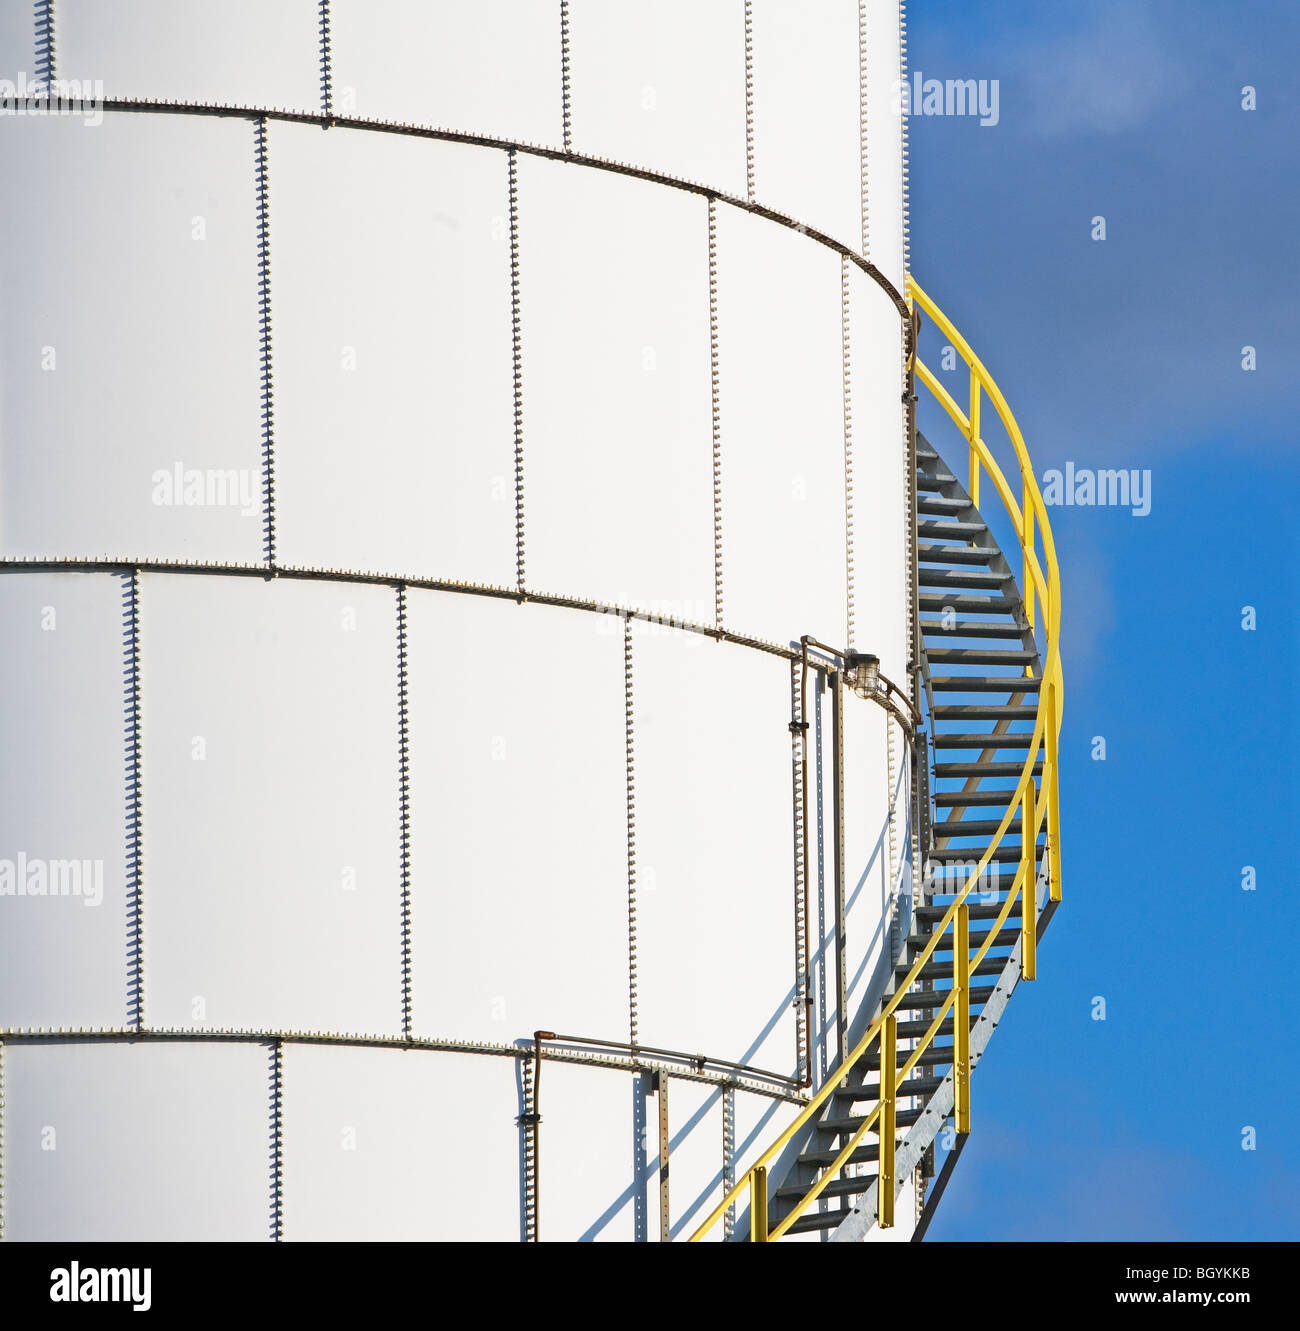 Steps on oil tank - Stock Image